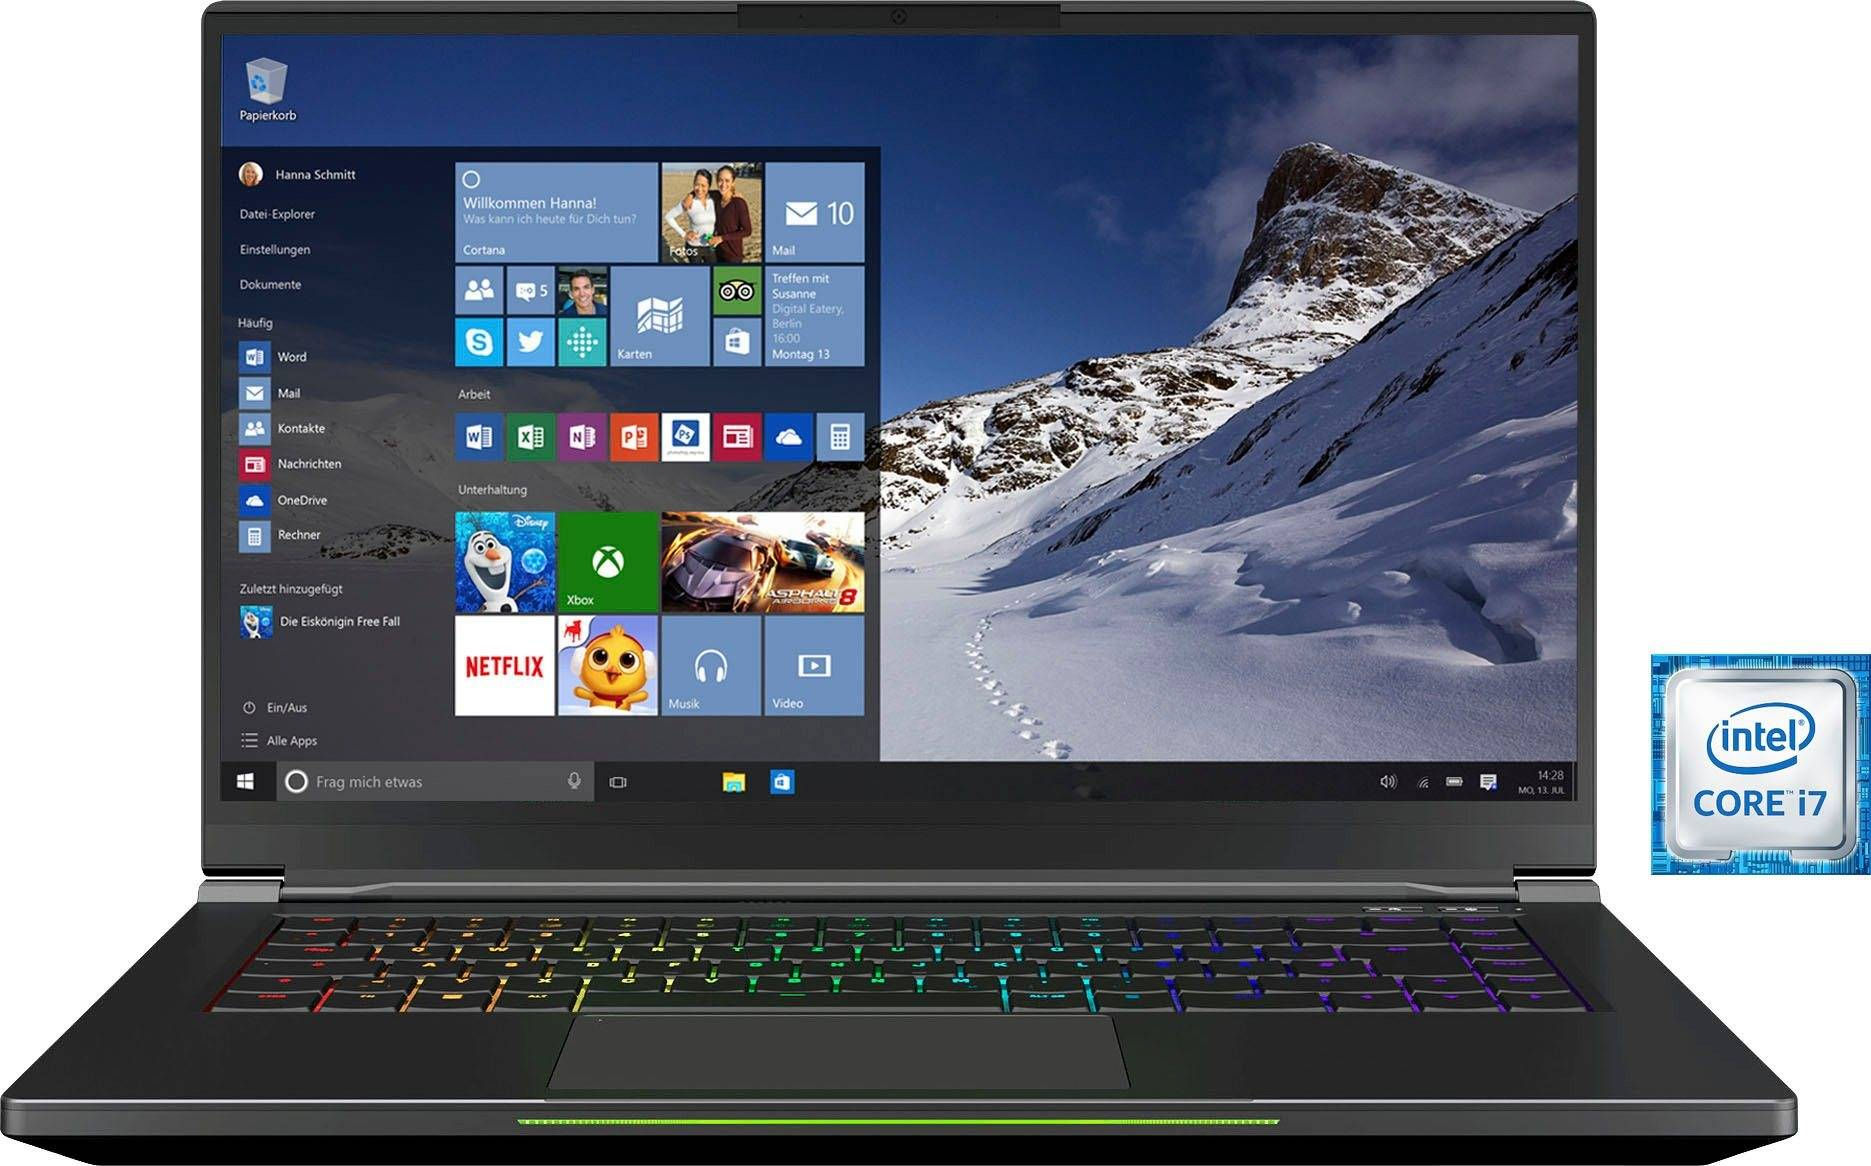 XMG FUSION 15-L19 Notebook (39,62 cm/15,6 Zoll, Intel Core i7, GeForce RTX™ 2070, 500 GB SSD, inkl. Office-Anwendersoftware Microsoft 365 Single im Wert von 69 Euro)